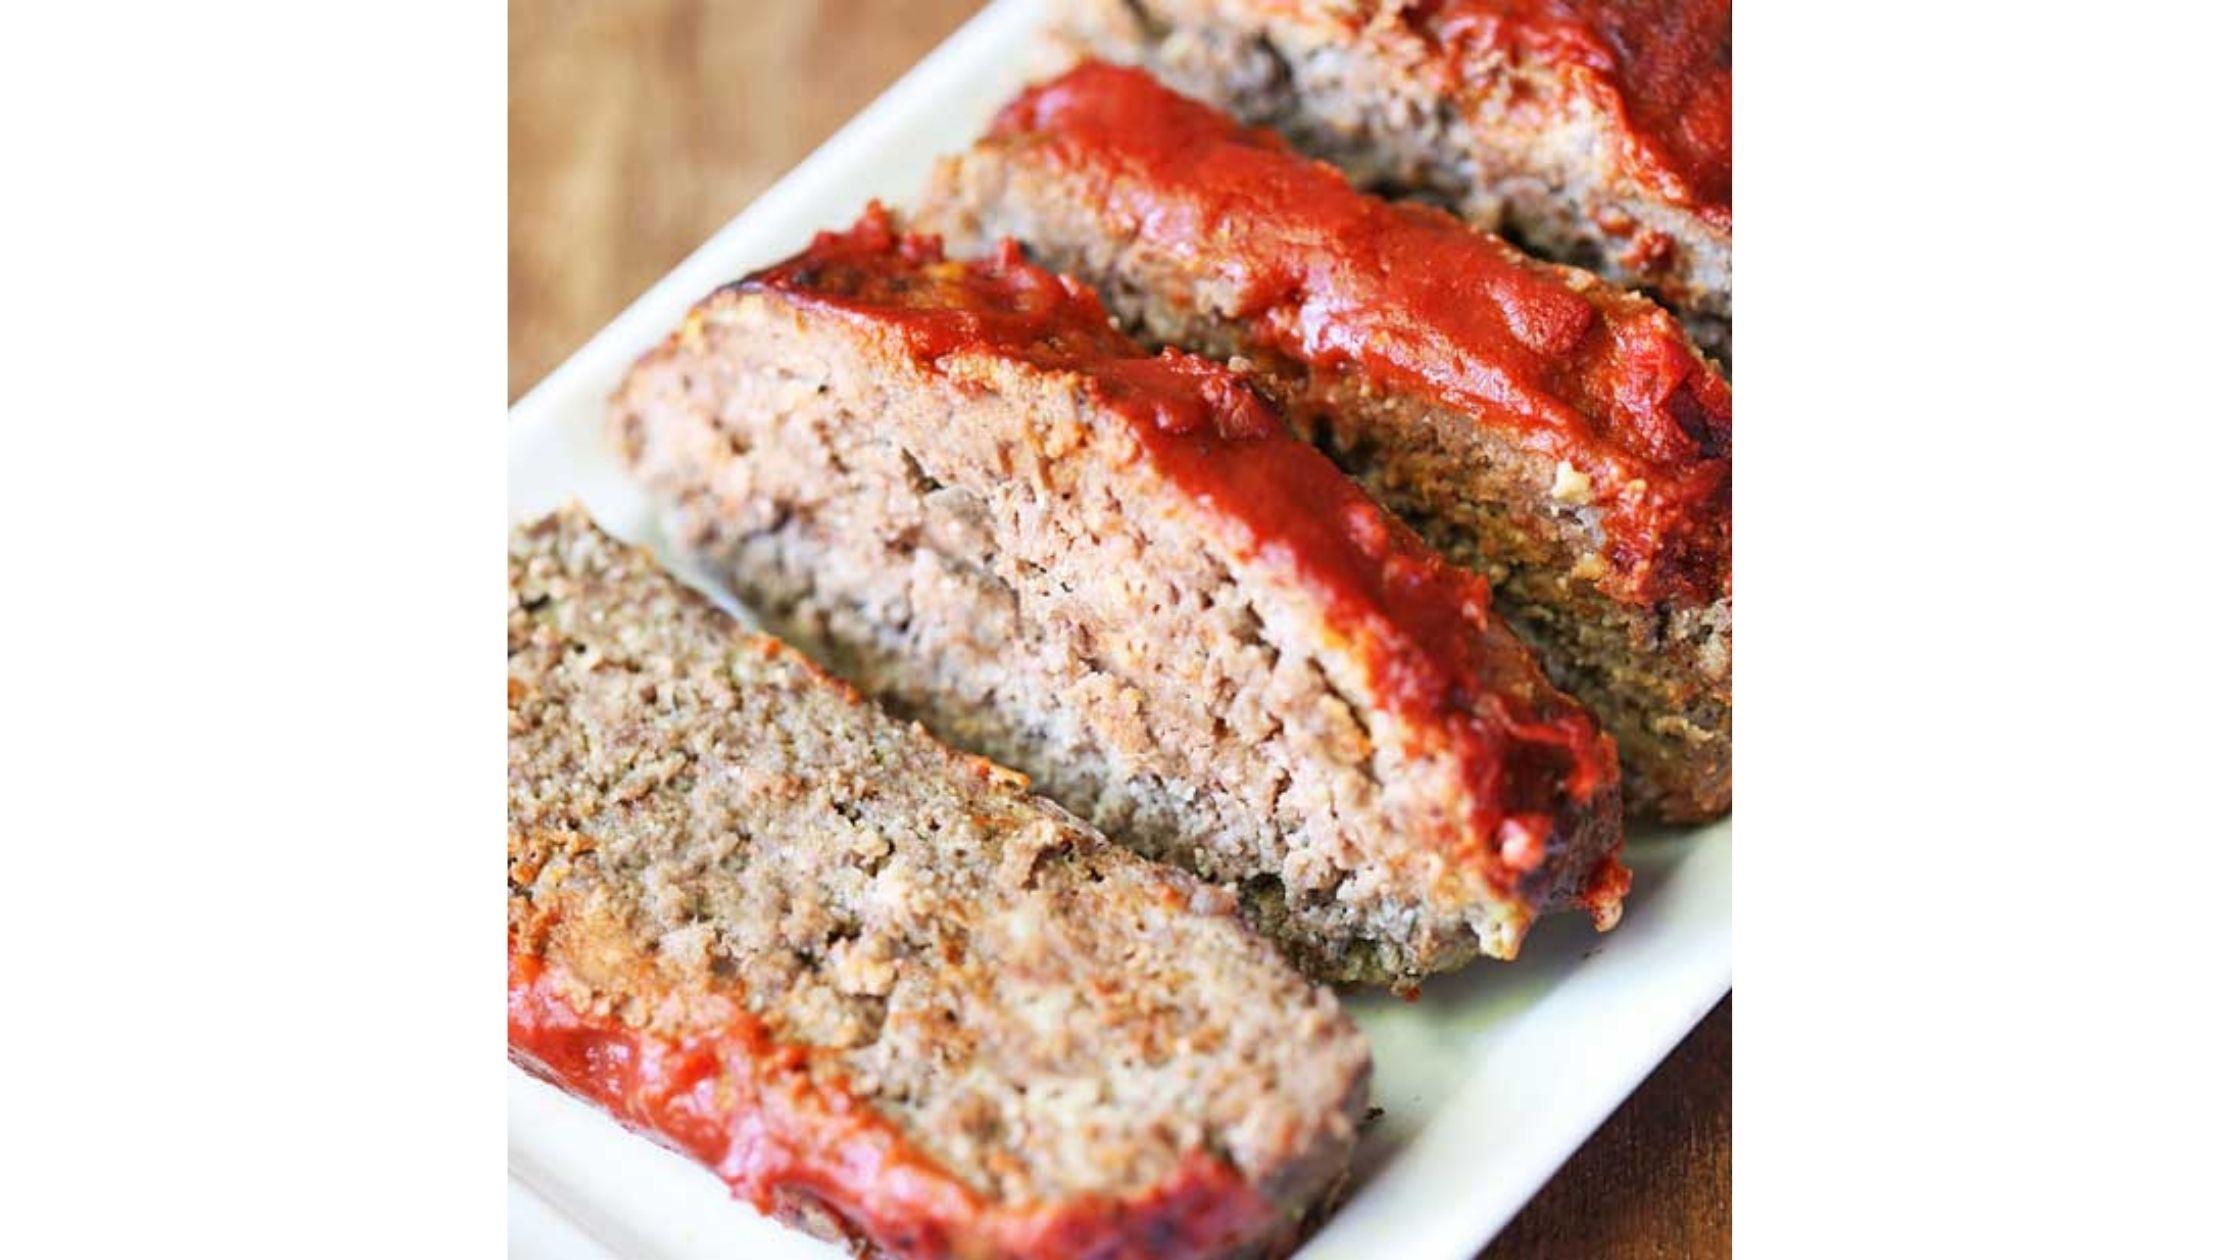 Juicy Keto Meatloaf by Healthy Recipes